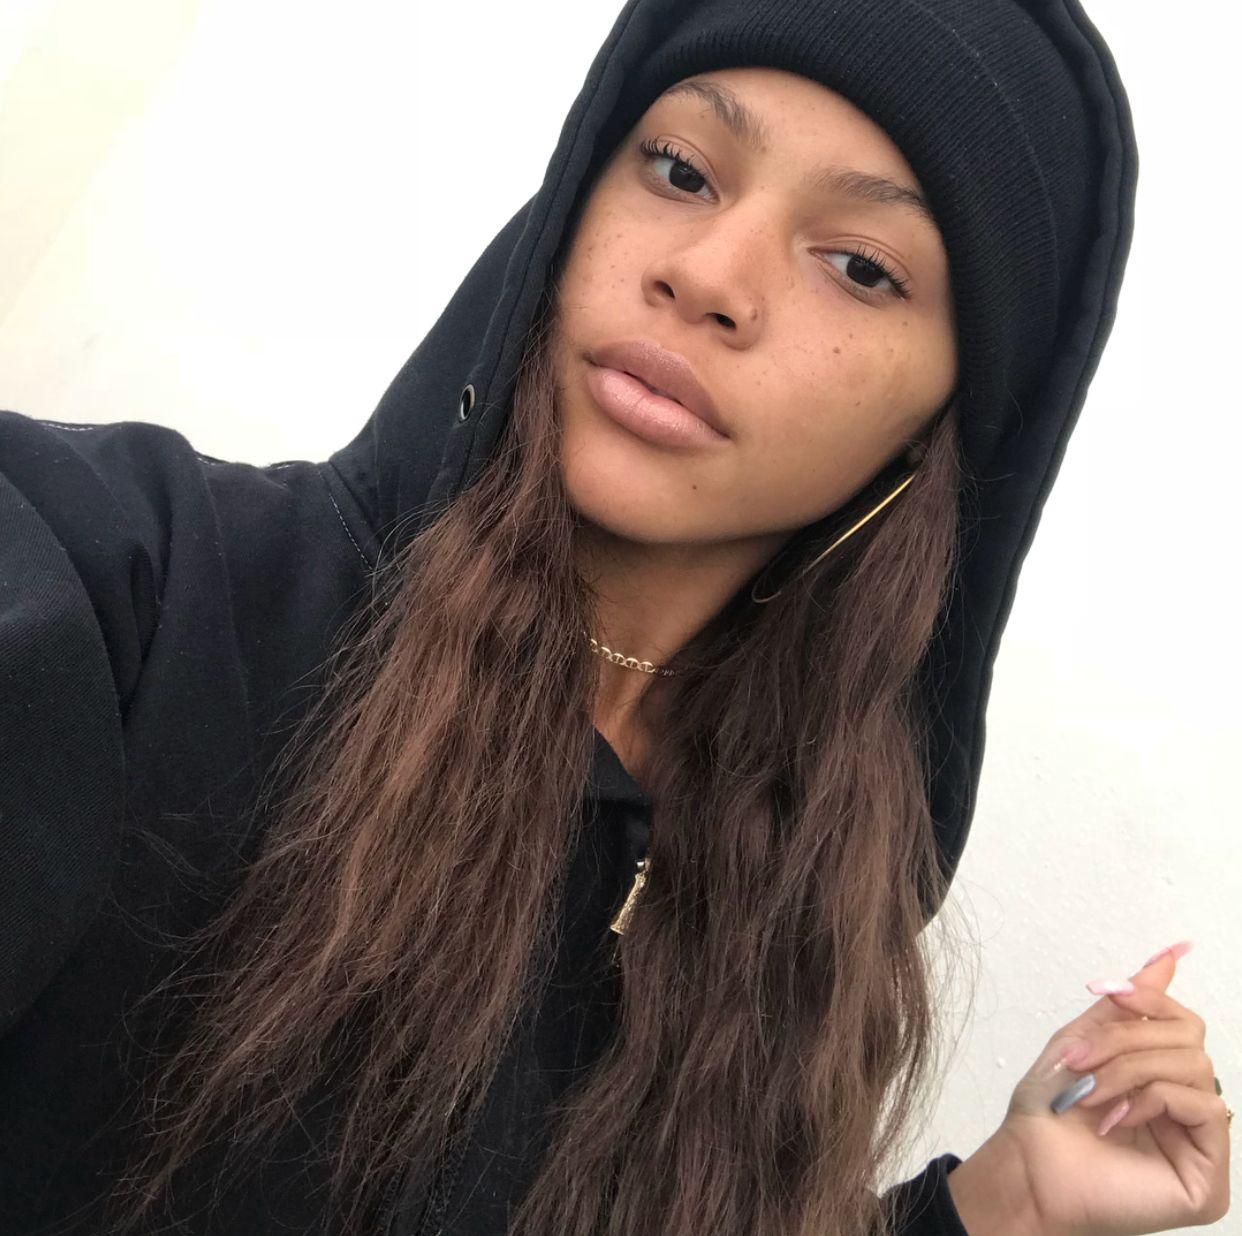 Pin by D💛 on ☀️GLAMOR☀️ ☀️GIRLS Cool makeup looks, Hair